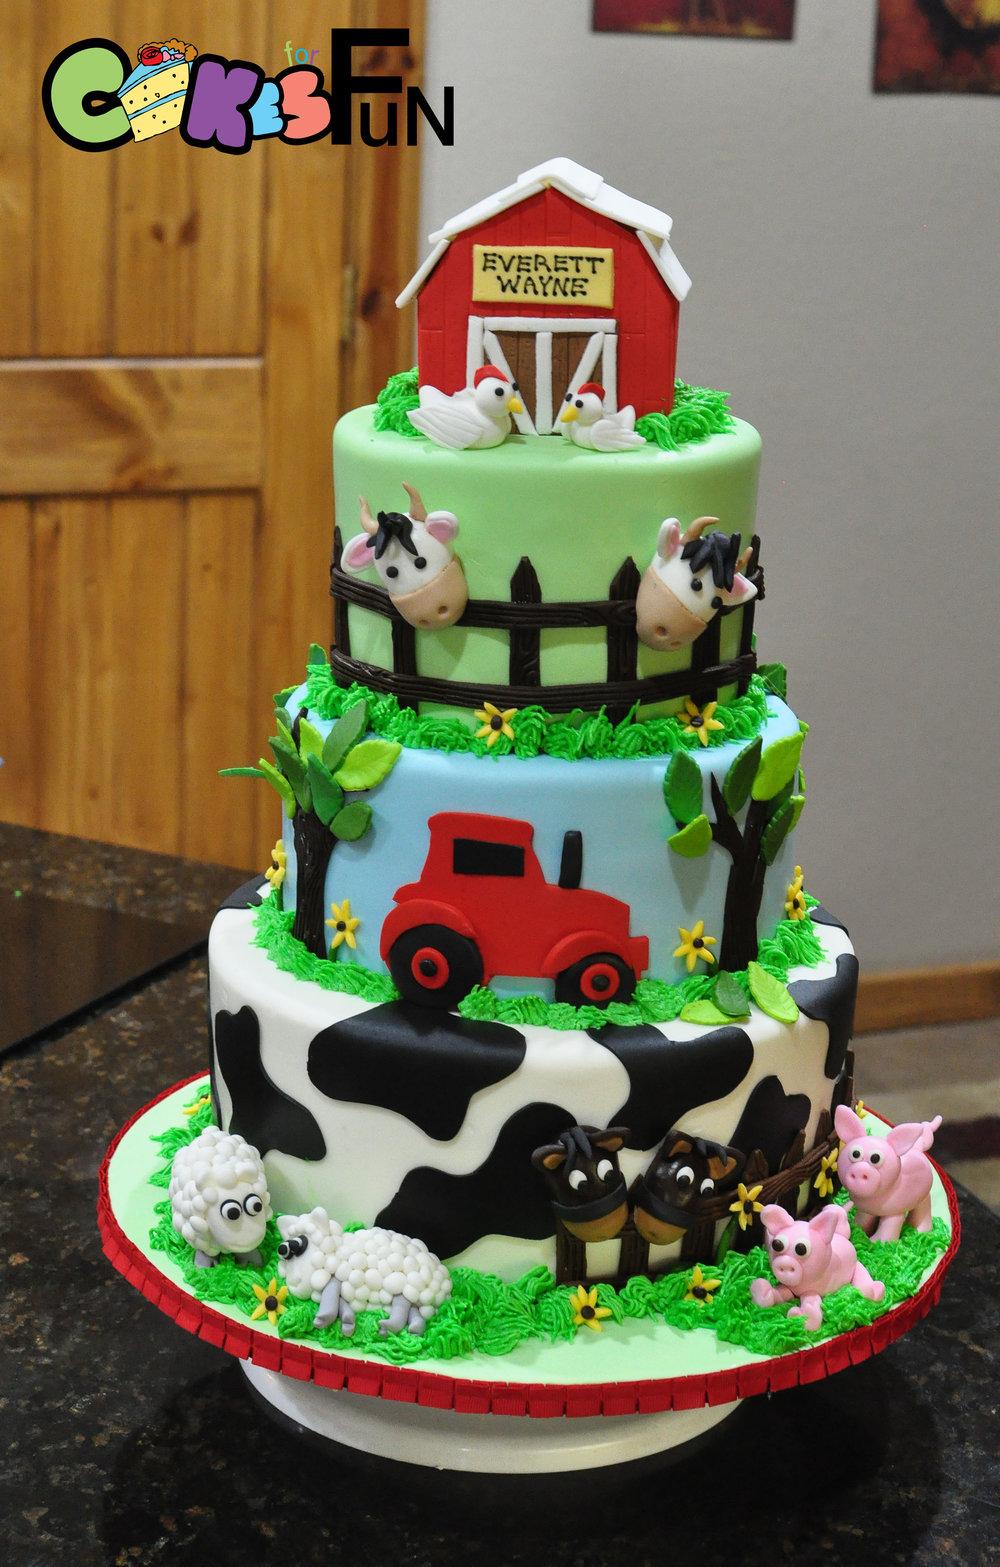 Farm cake baby shower-branton-05052018.jpg